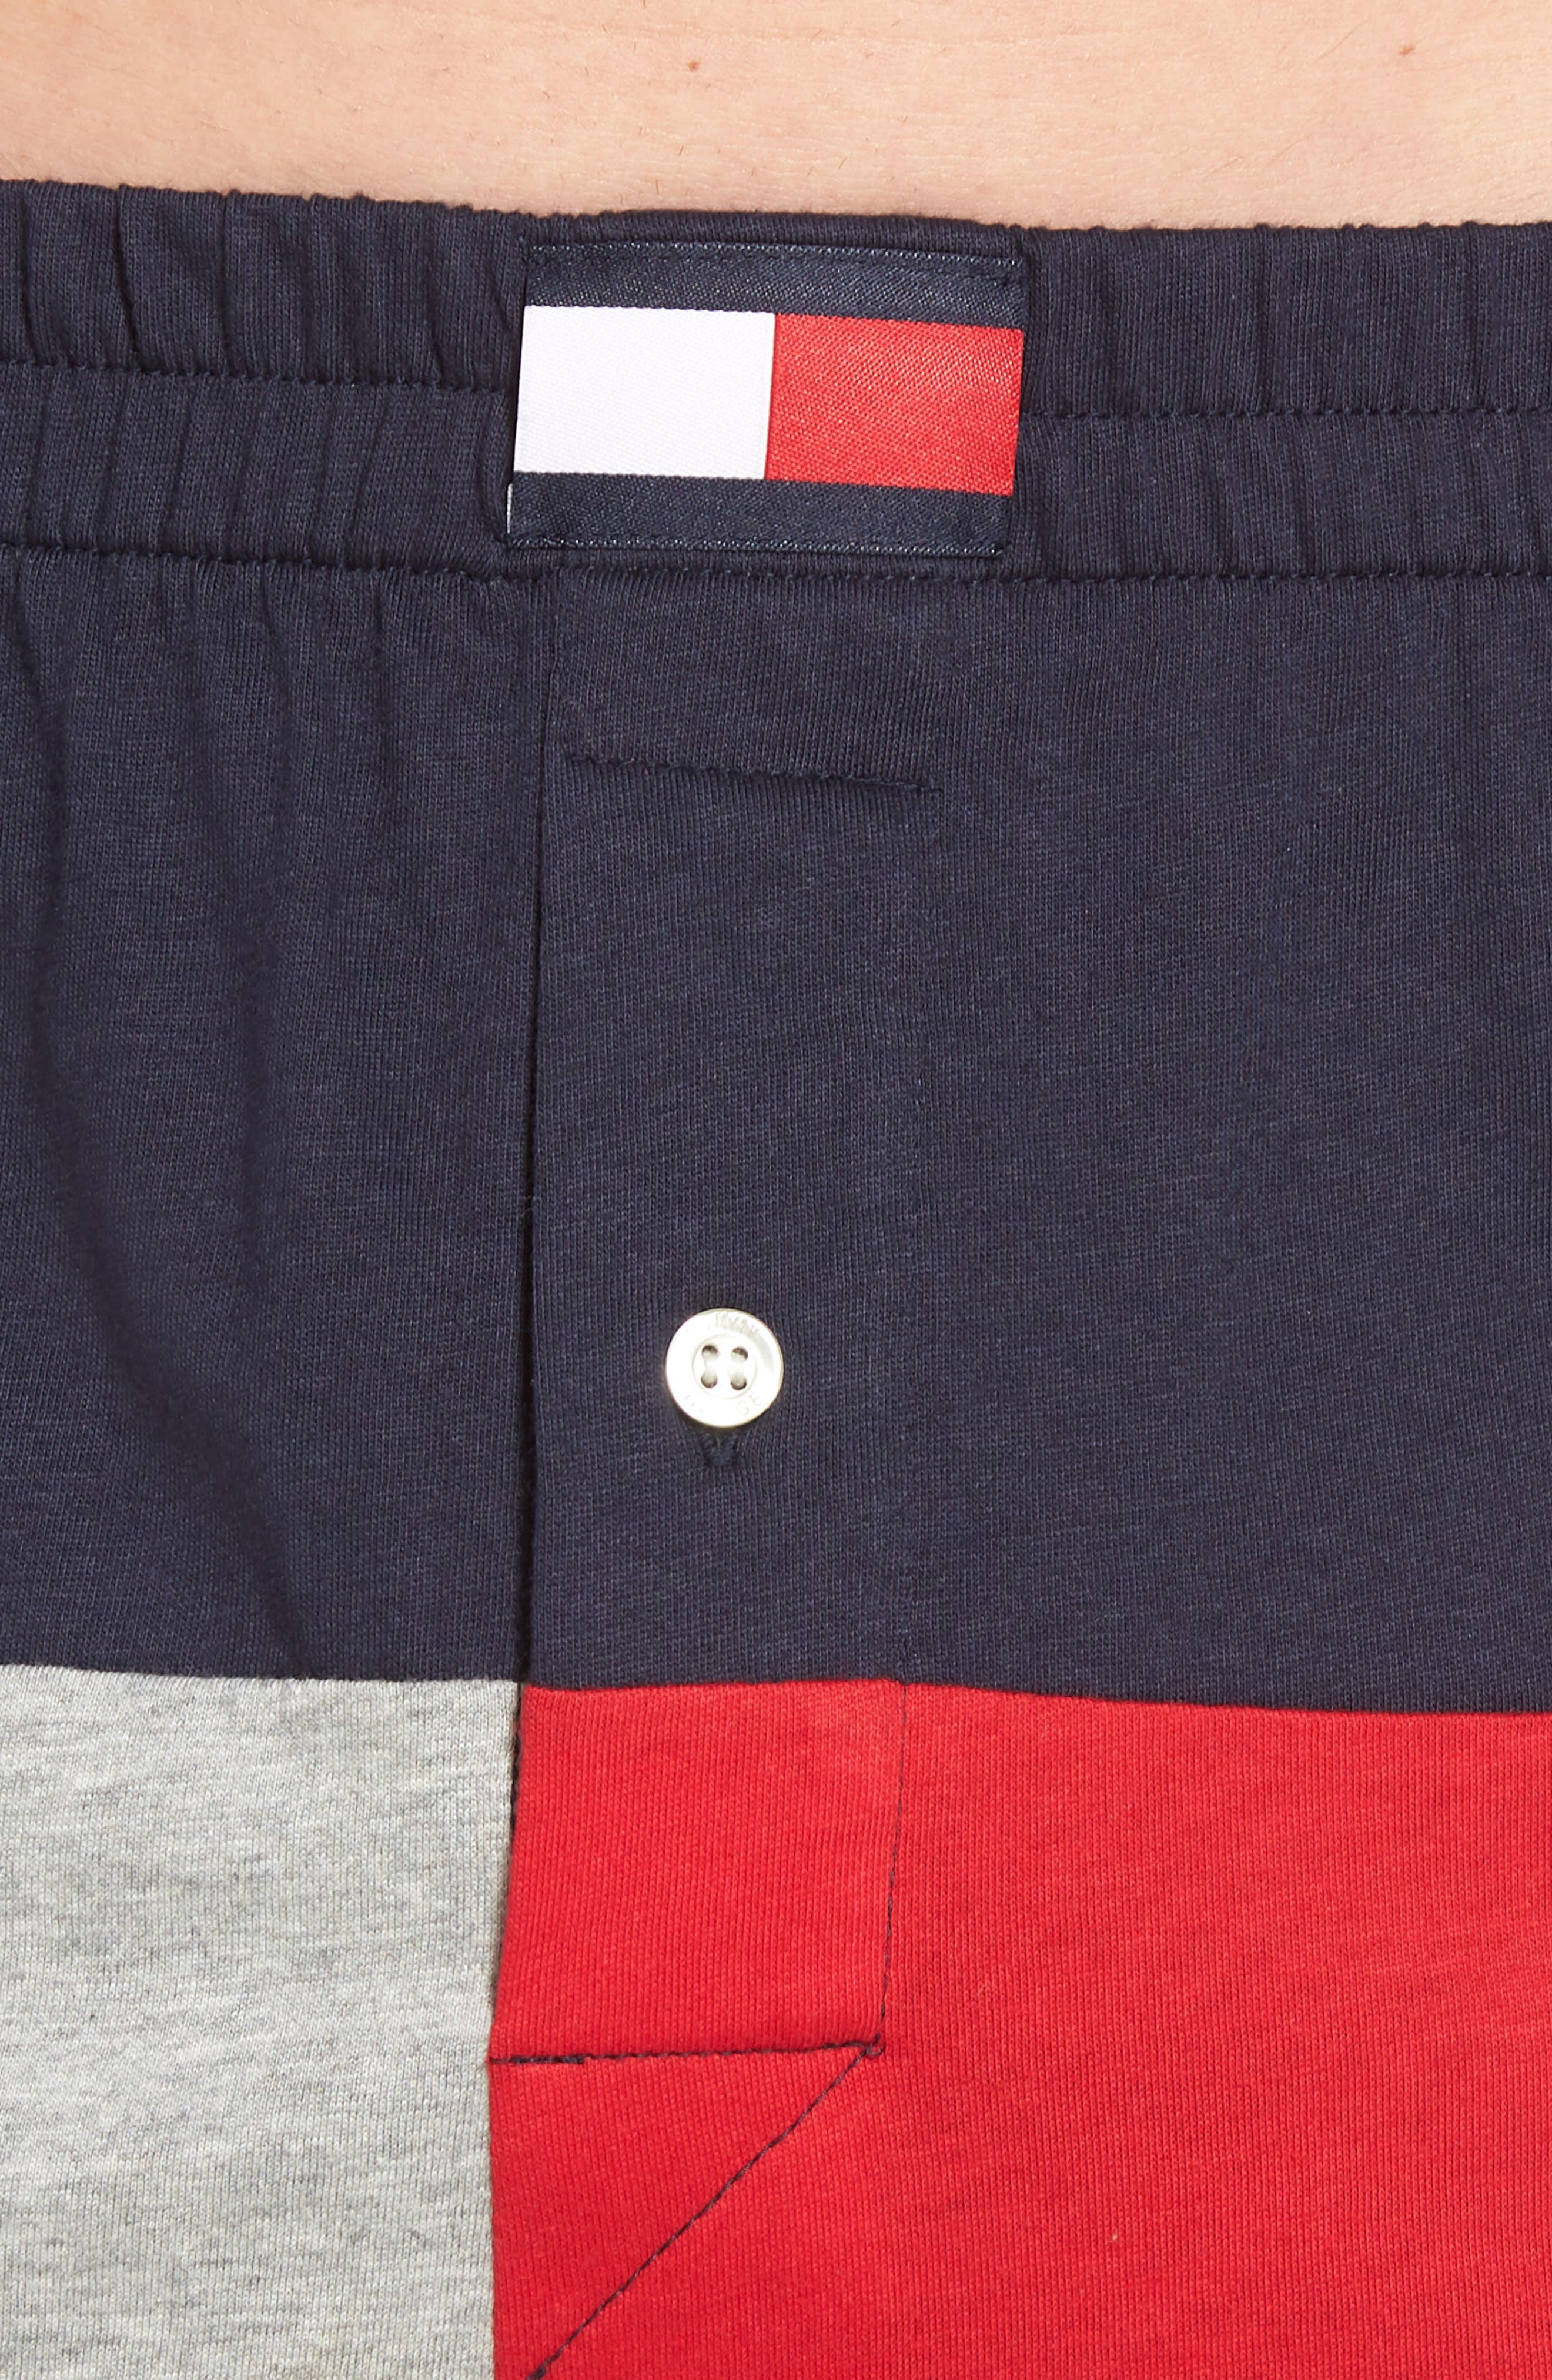 Colorblock Knit Boxers,                             Alternate thumbnail 4, color,